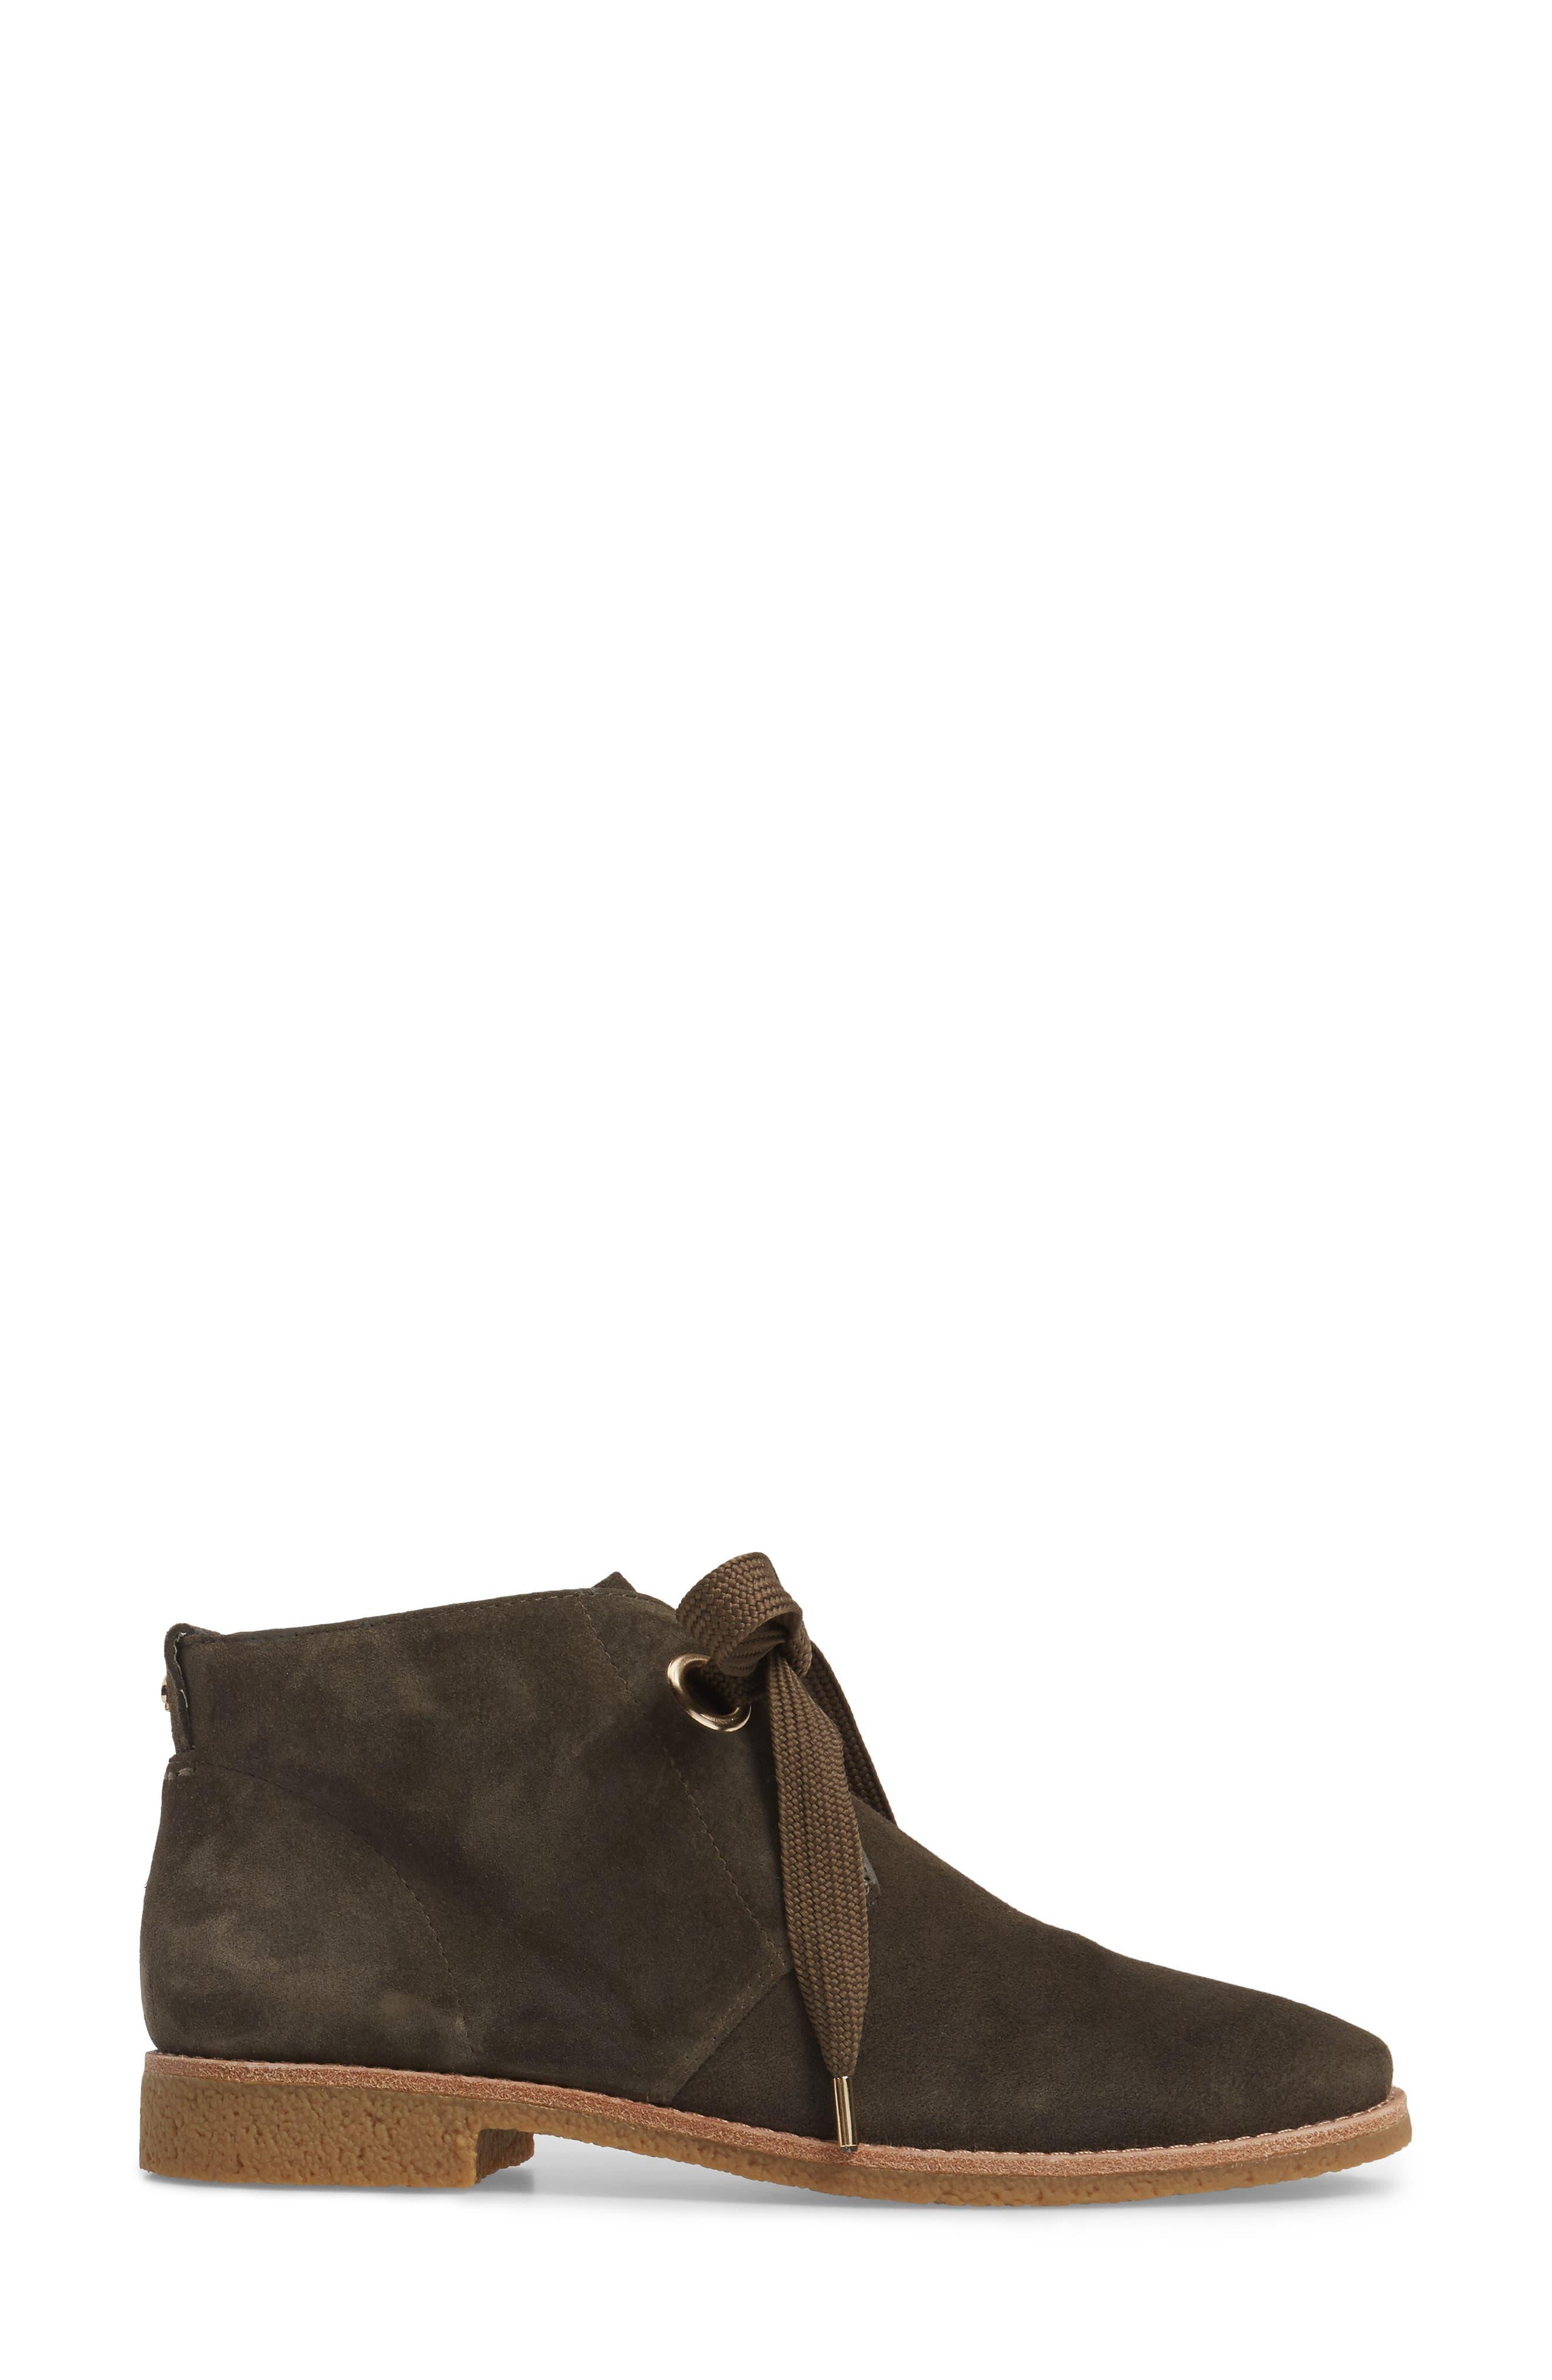 Alternate Image 3  - kate spade new york barrow chukka boot (Women)